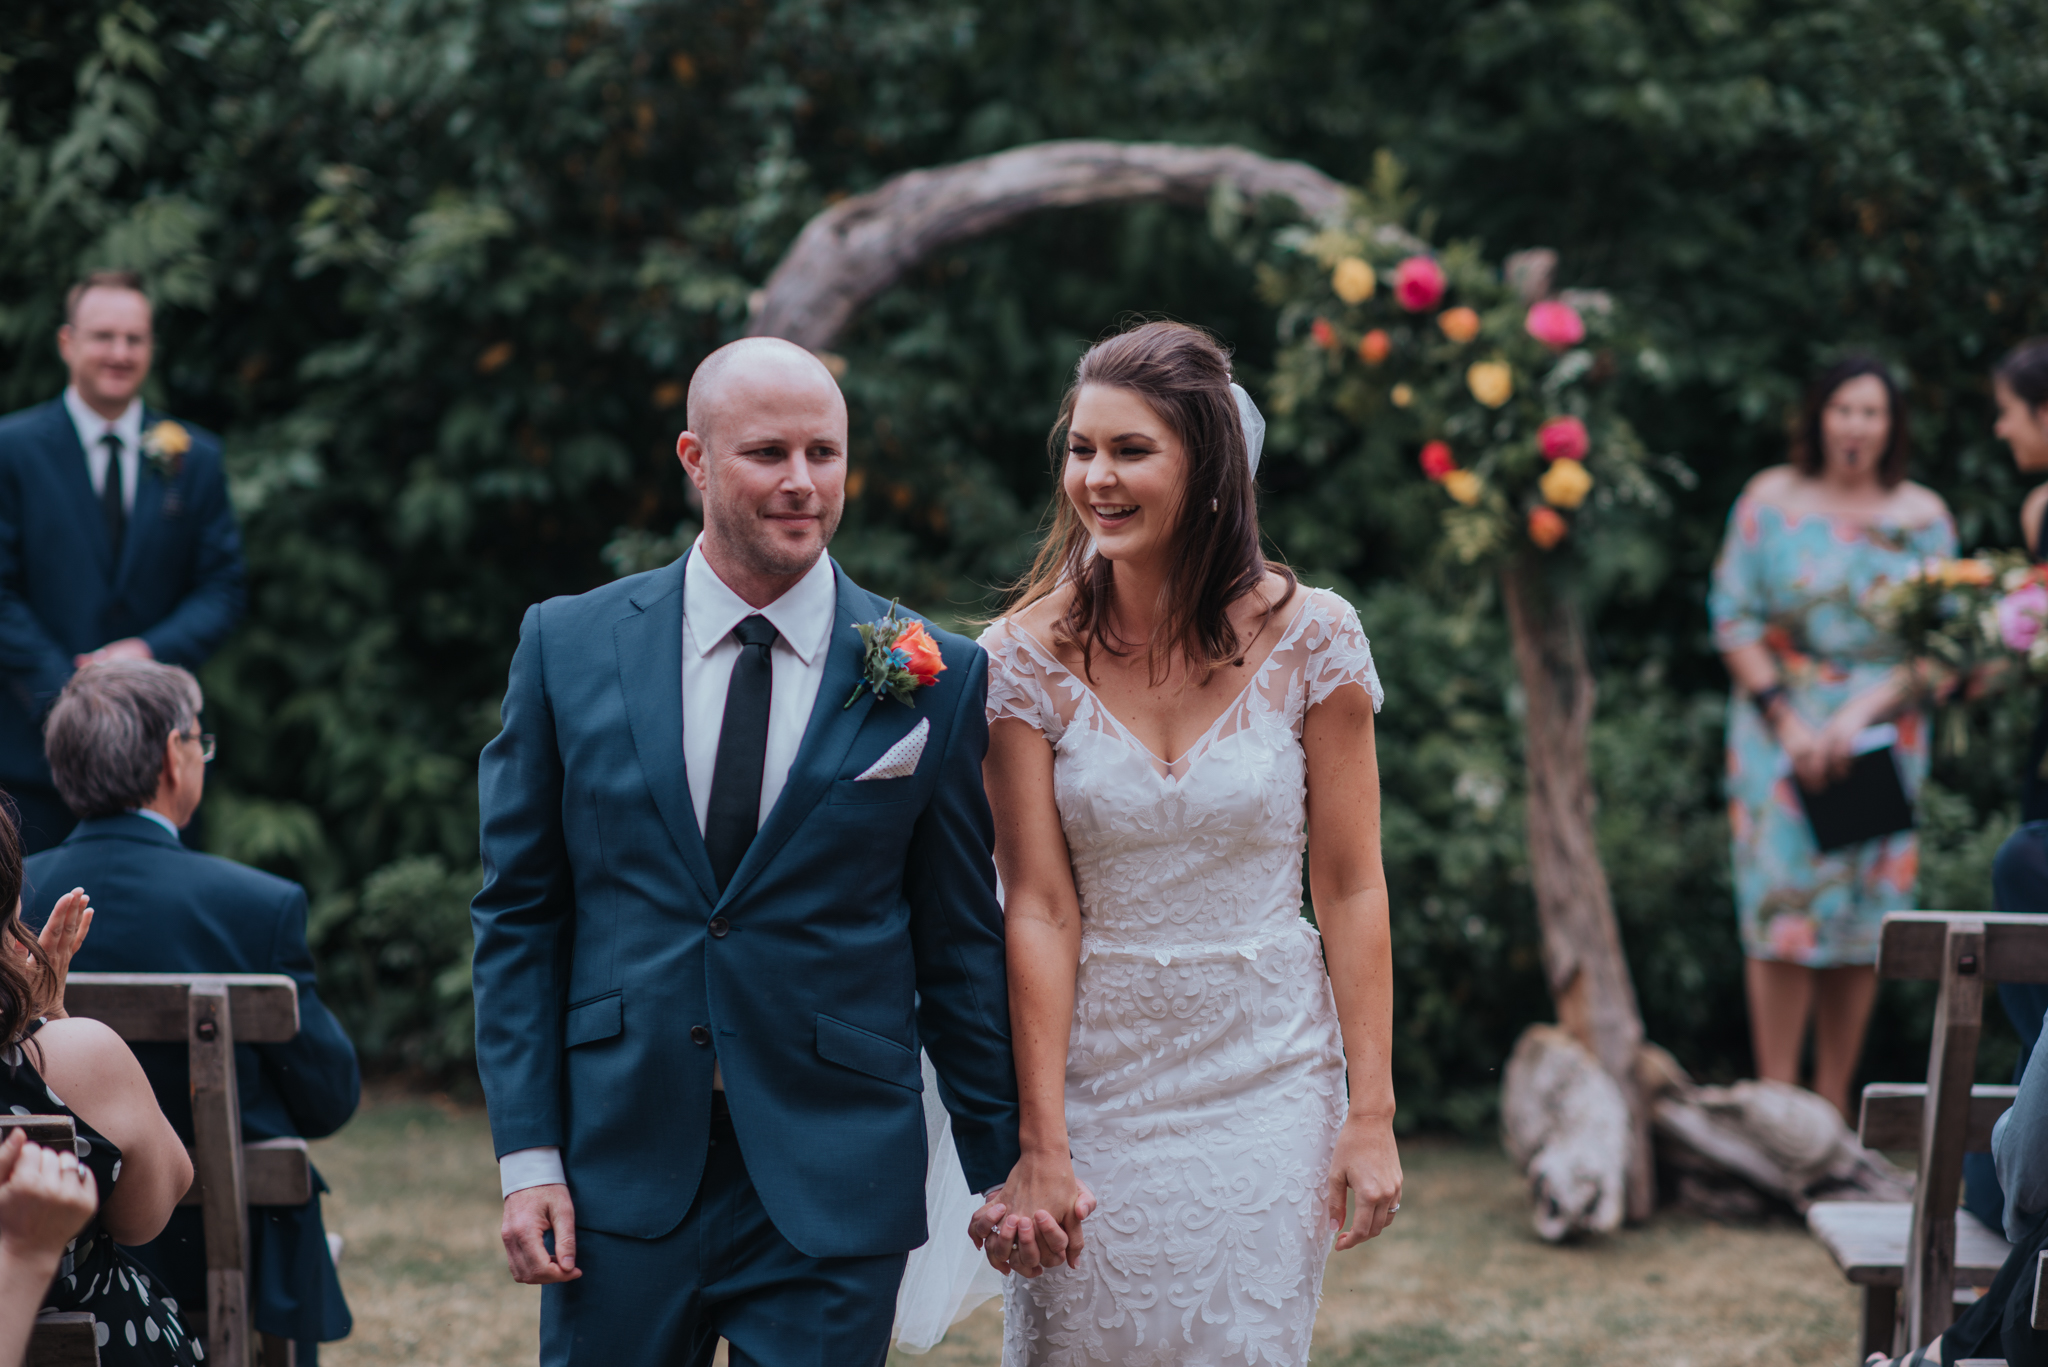 LOVELENSCAPES PHOTOGRAPHY • VISUAL POETRY • NEW ZEALAND WEDDING PHOTOGRAPHER • AUSTRALIAN WEDDING PHOTOGRAPHER • BRISBANE • MELBOURNE • SYDNEY • HOBART • TARUREKA ESTATE • ANNA CAMPBELL • 121.jpg